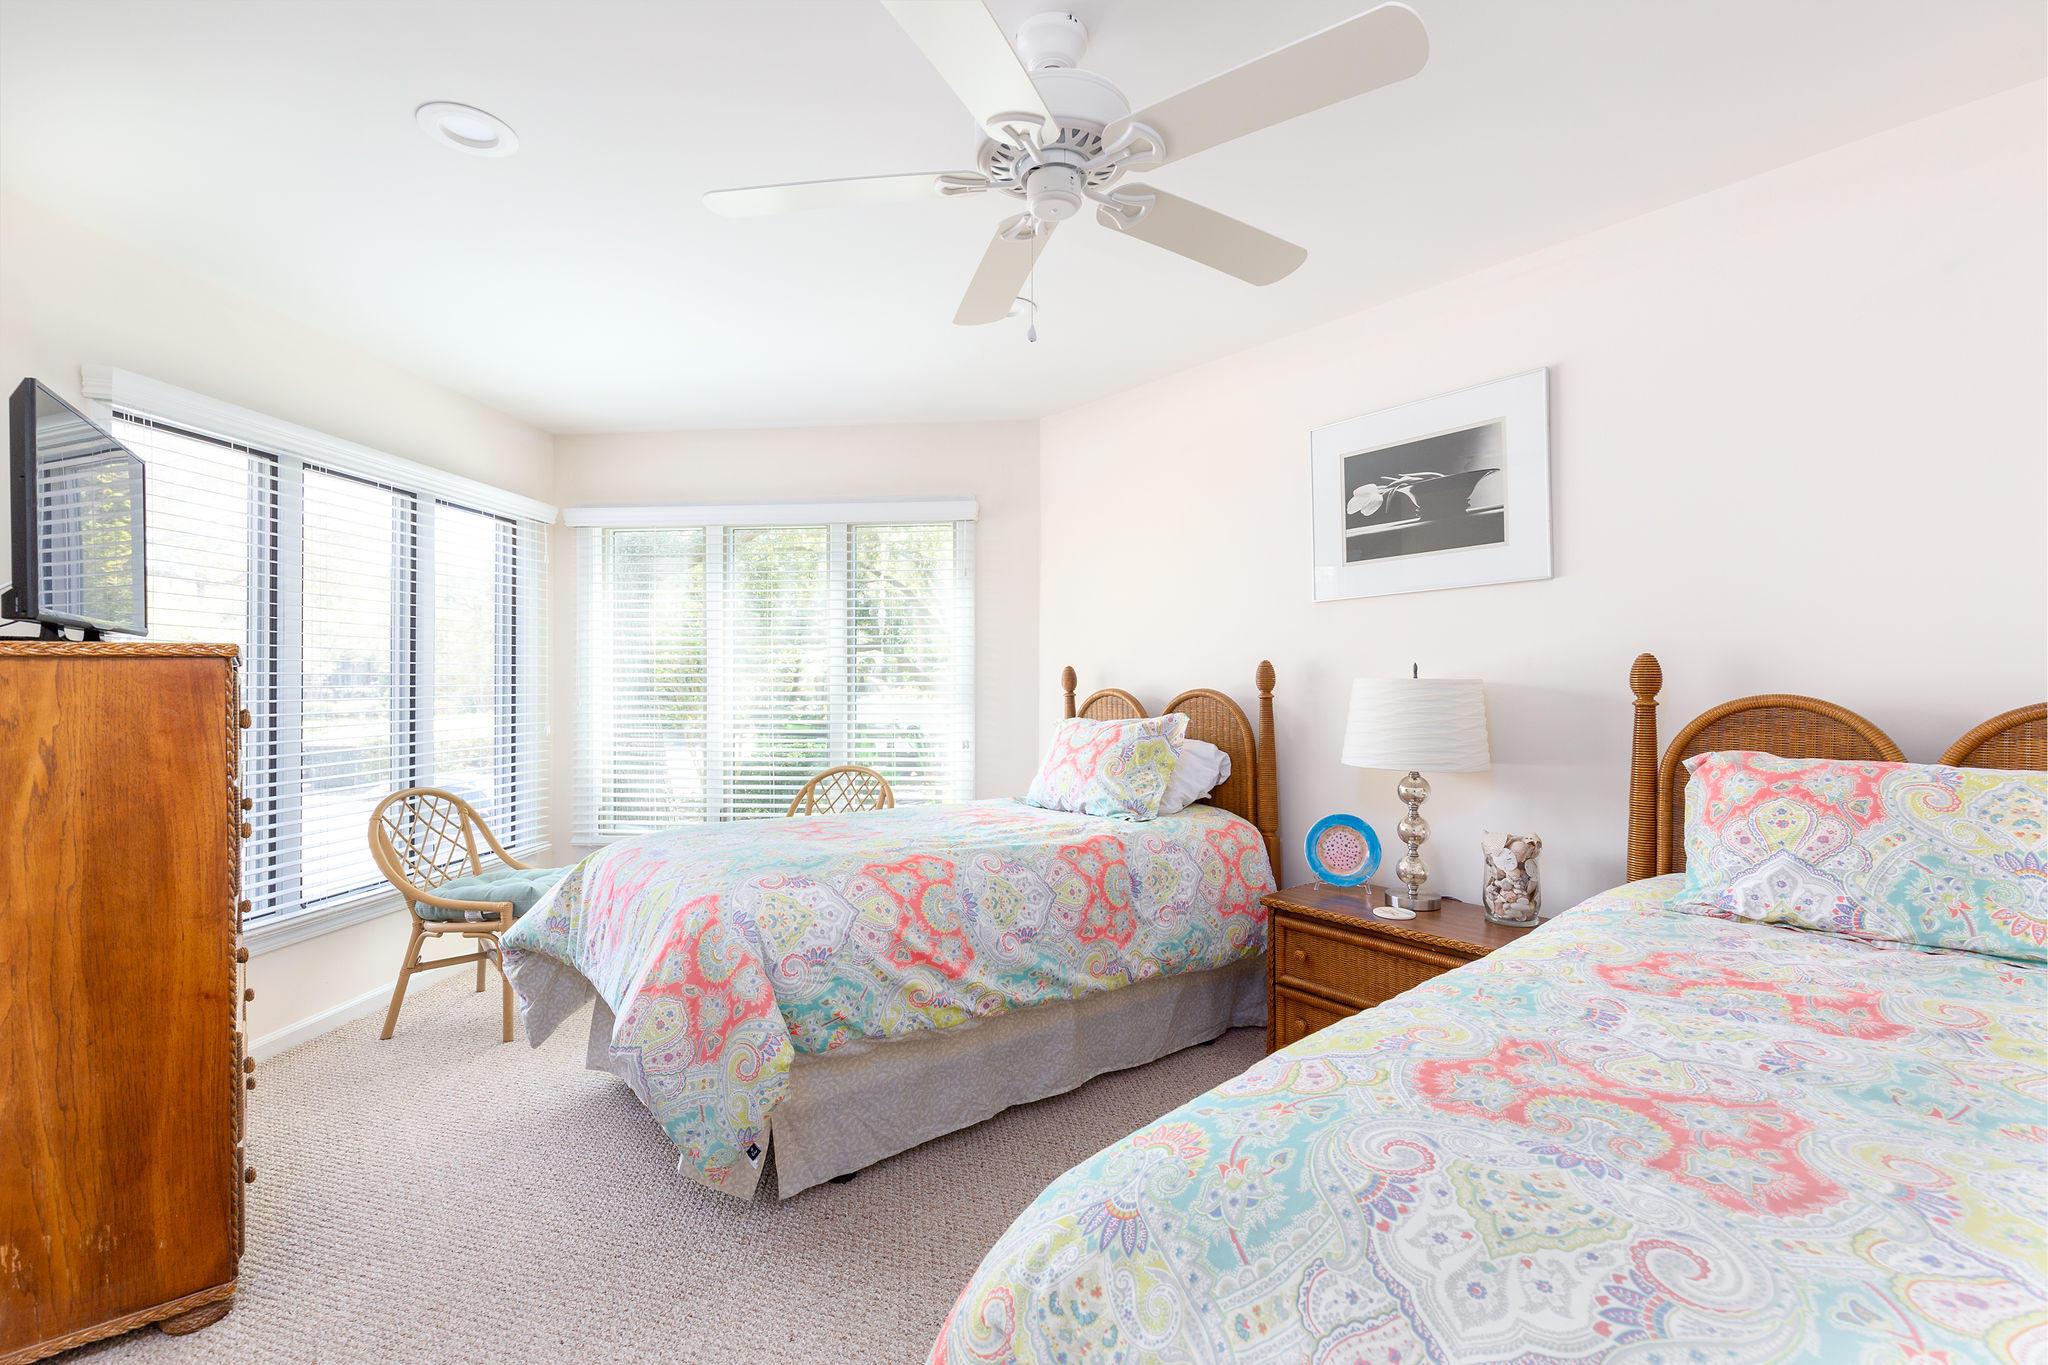 Kiawah Island Homes For Sale - 4767 Tennis Club, Kiawah Island, SC - 23